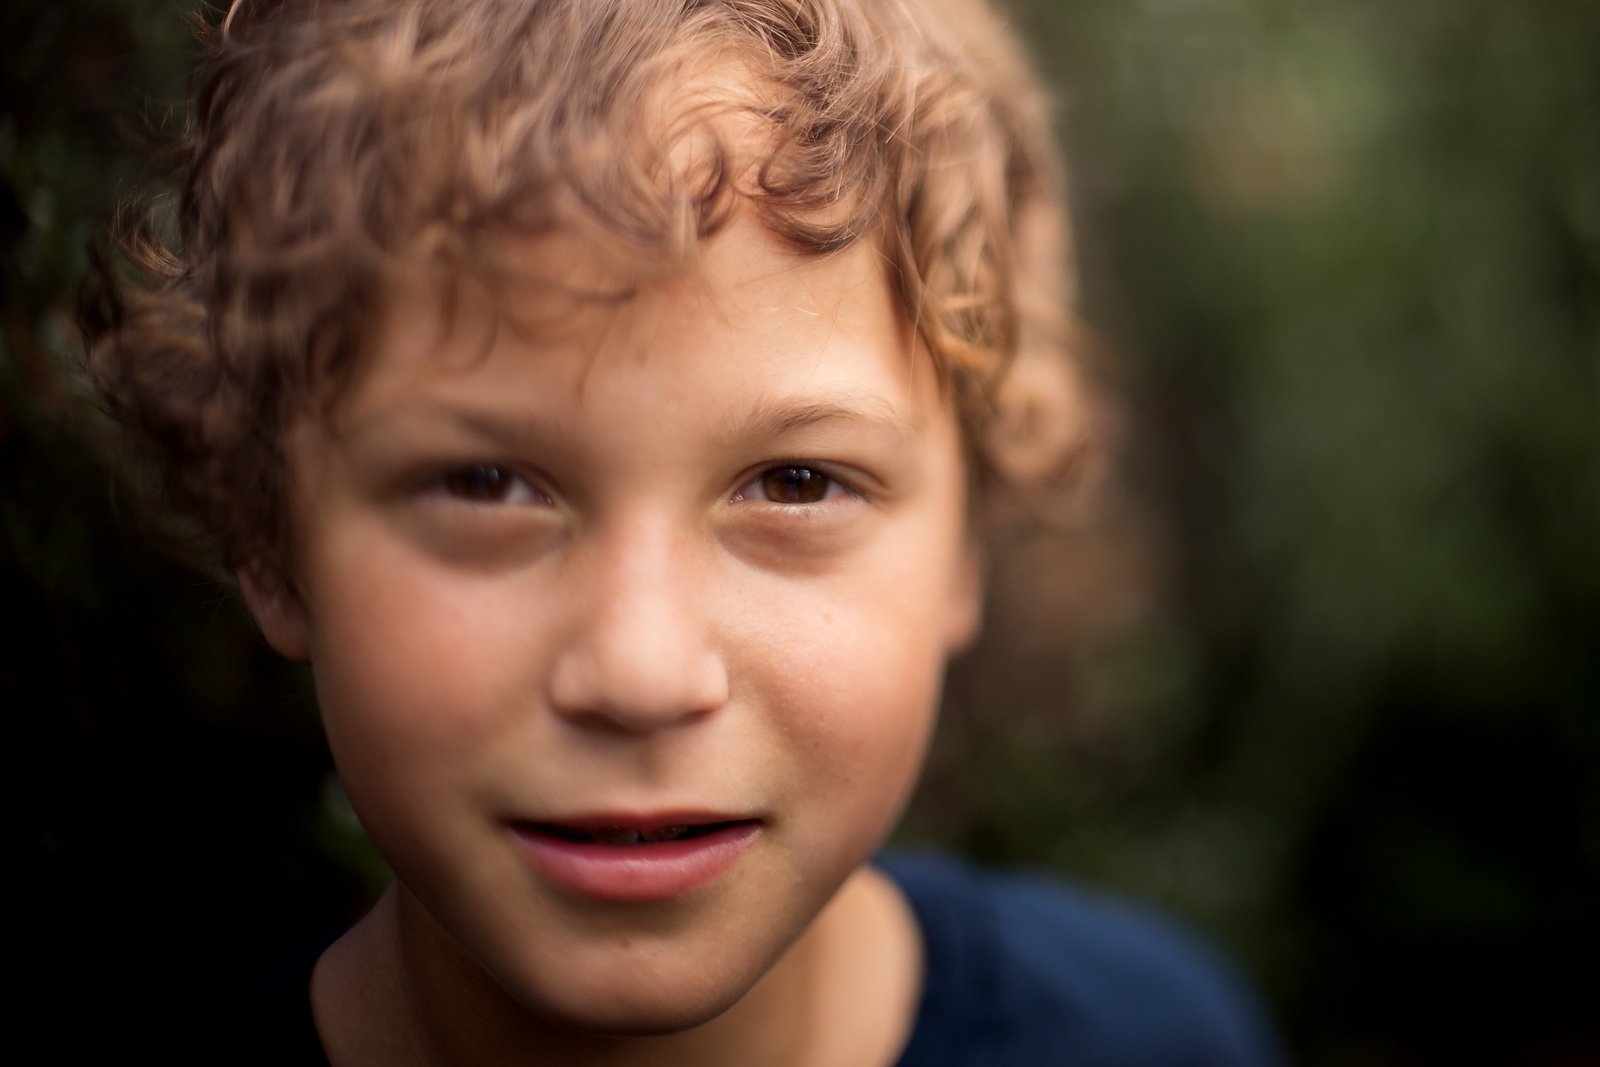 freelensed portrait of young boy by Celeste Pavlik